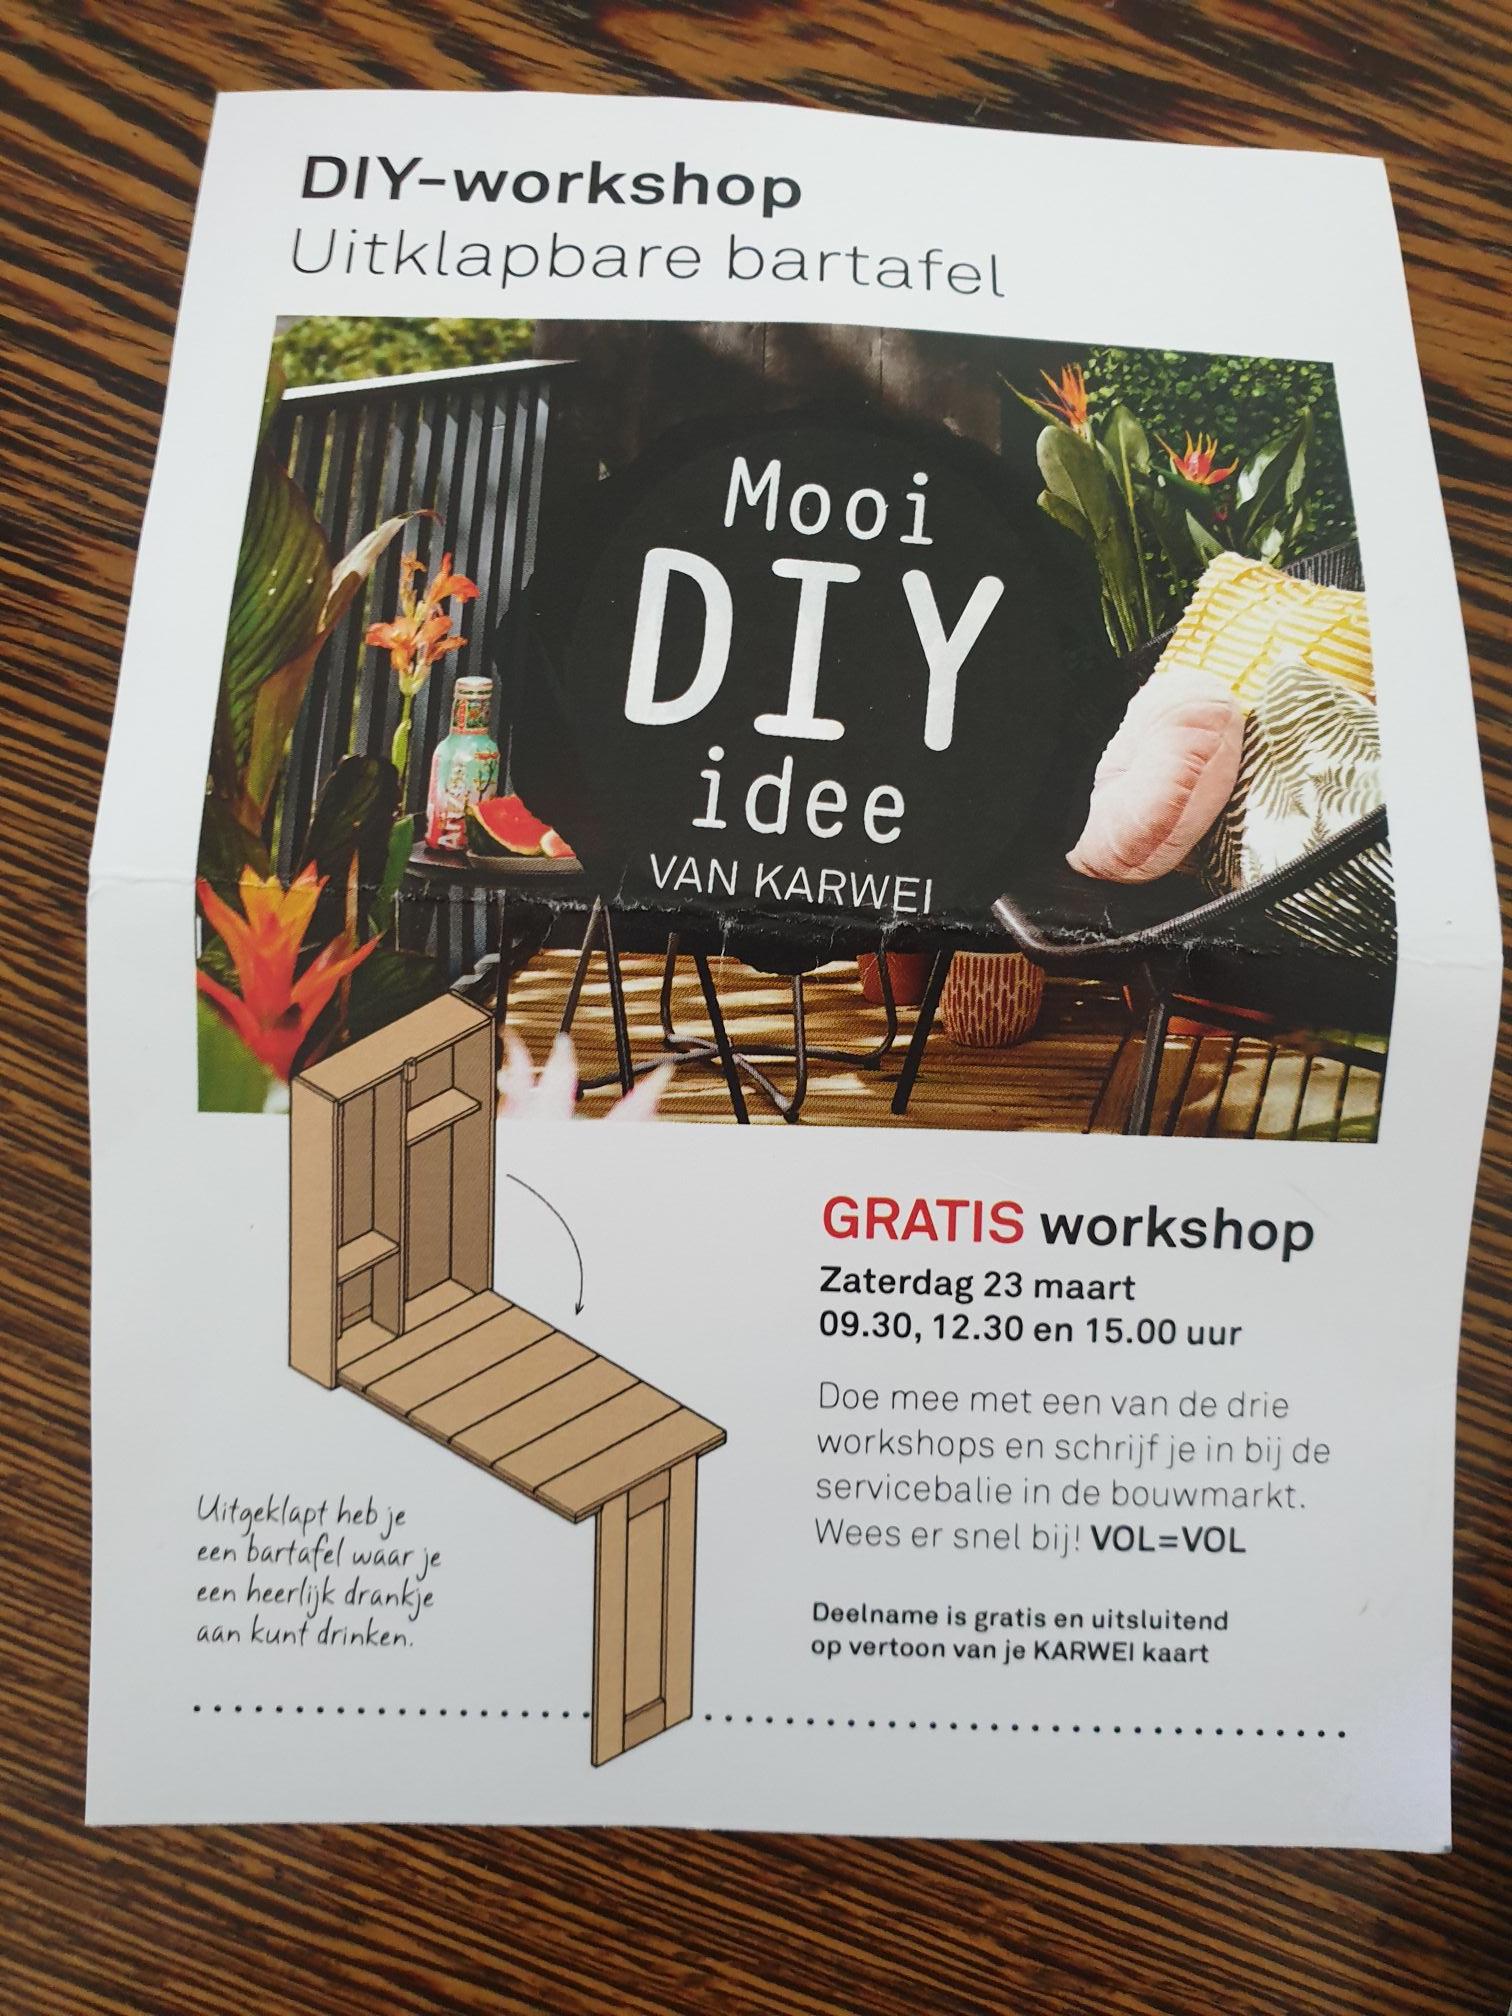 Gratis karwei workshop 23 maart 'uitklapbare bartafel'